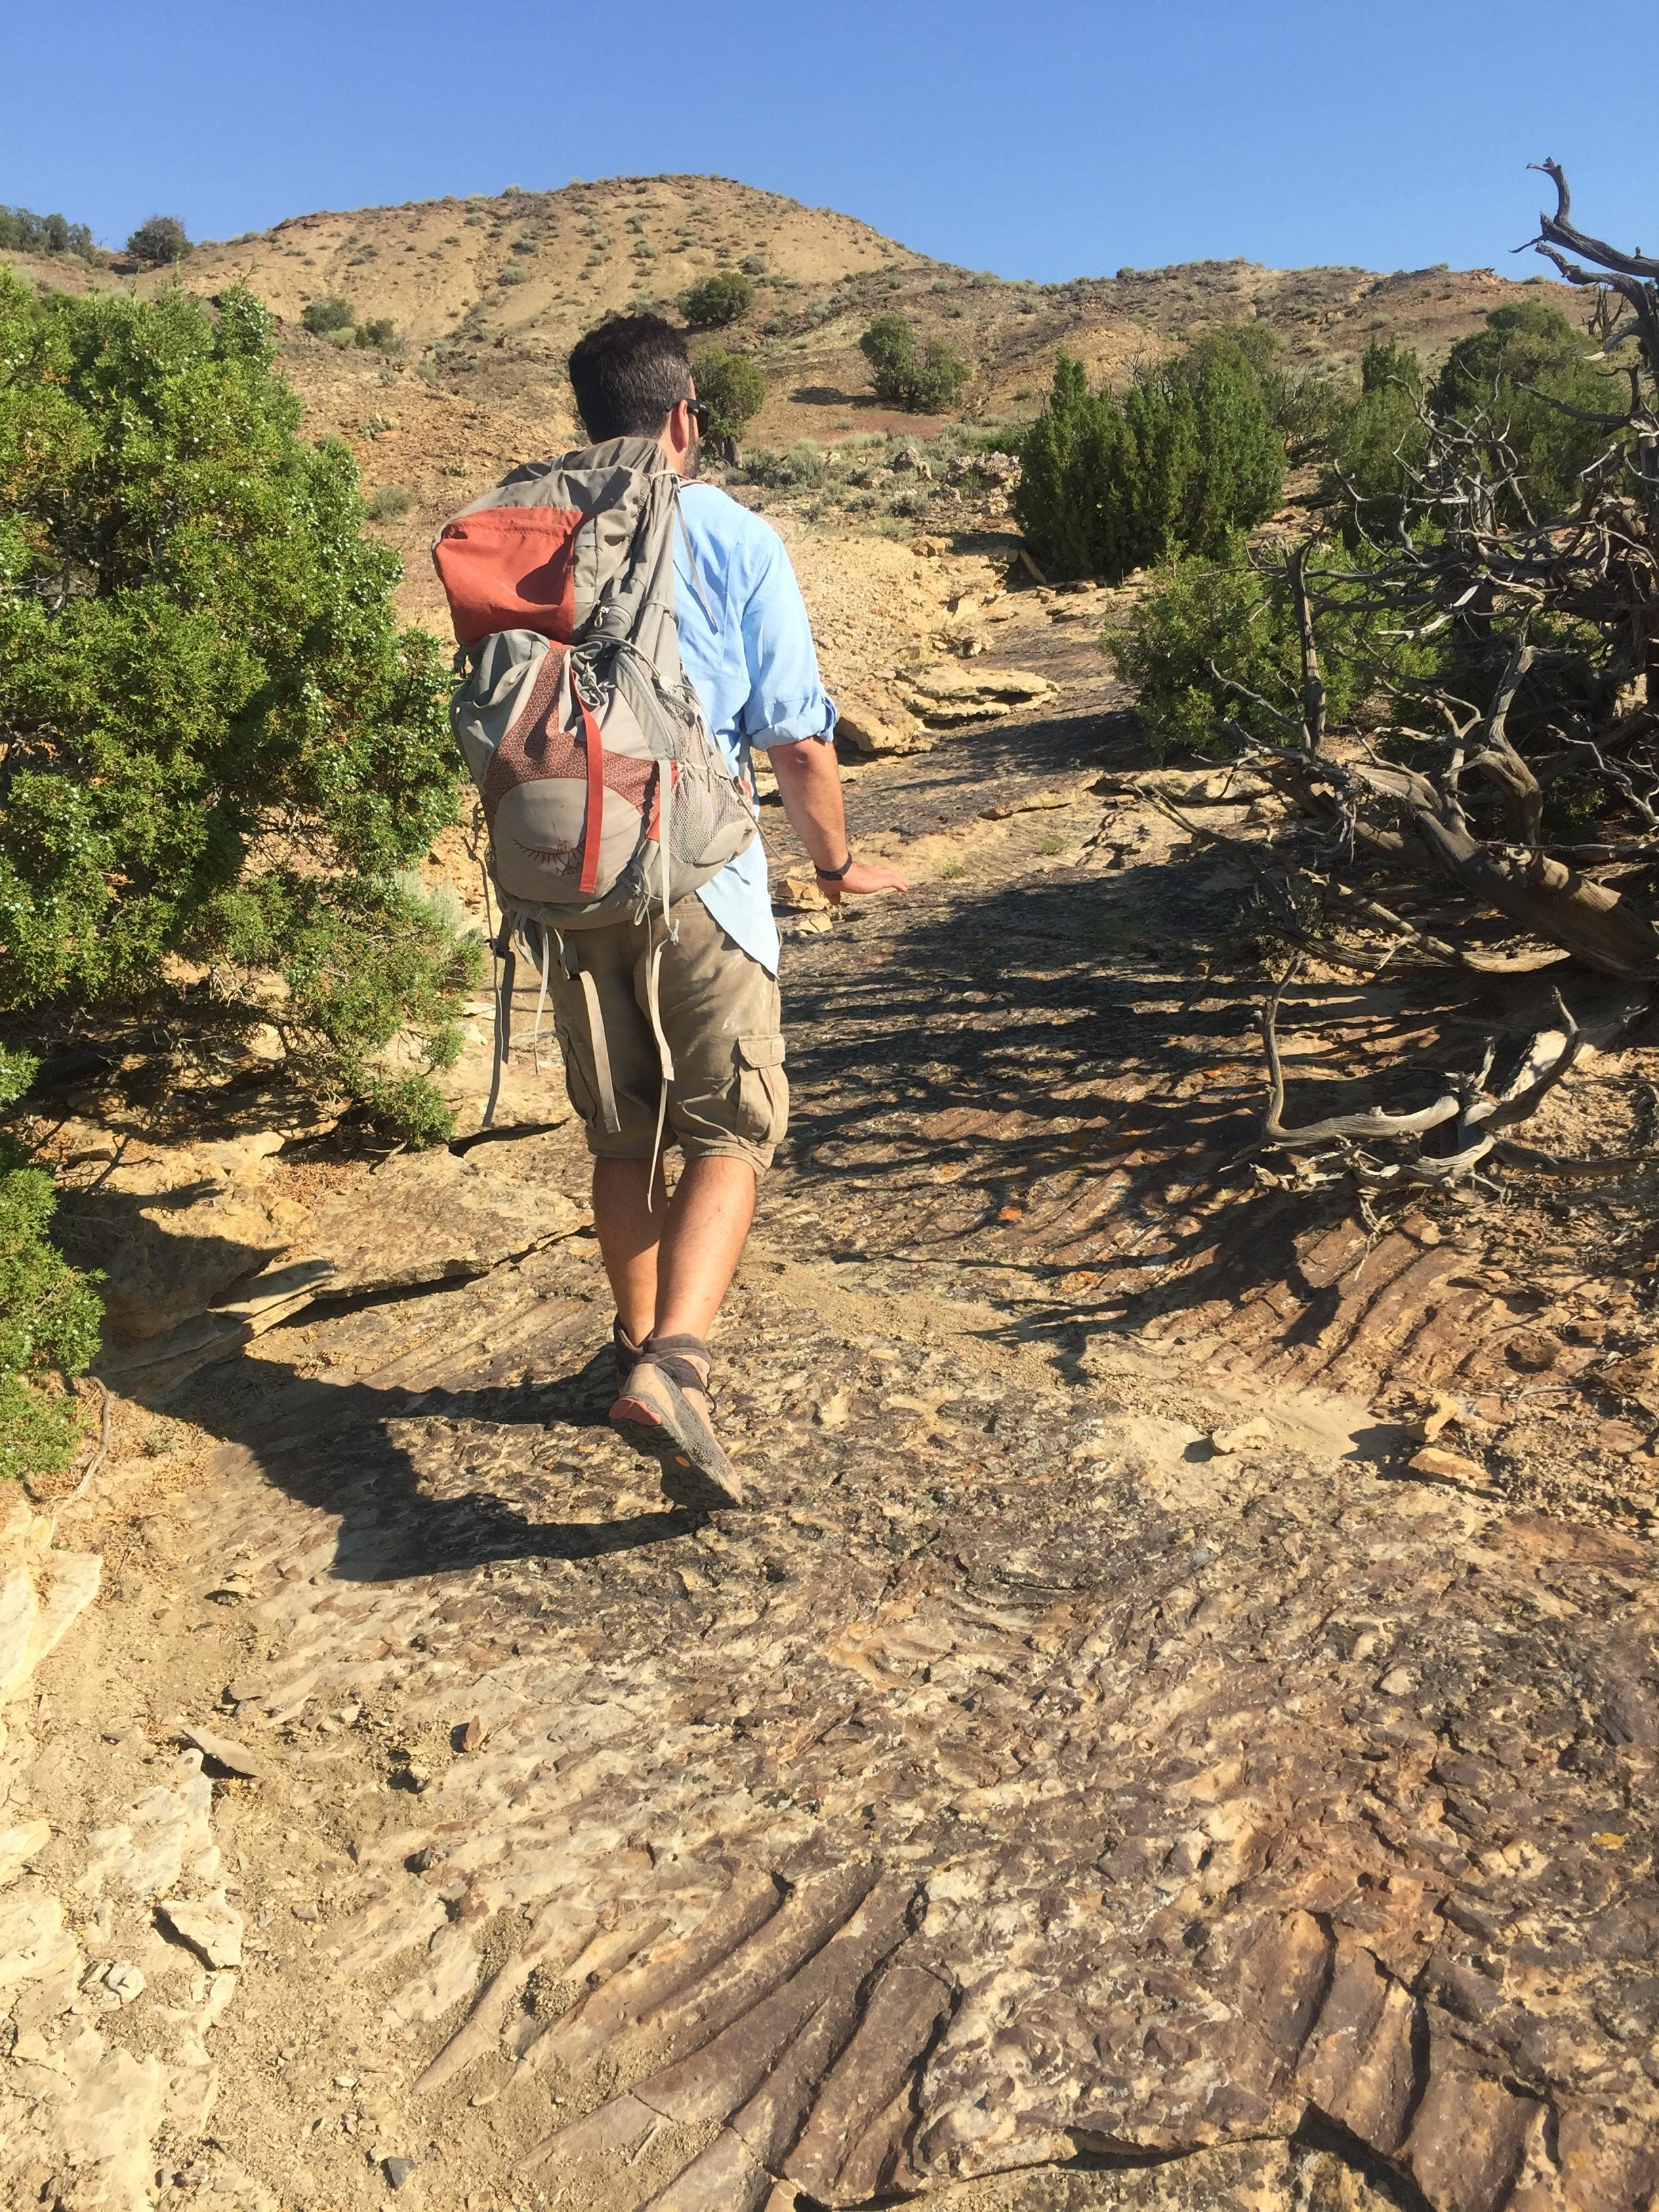 Hiking through the badlands